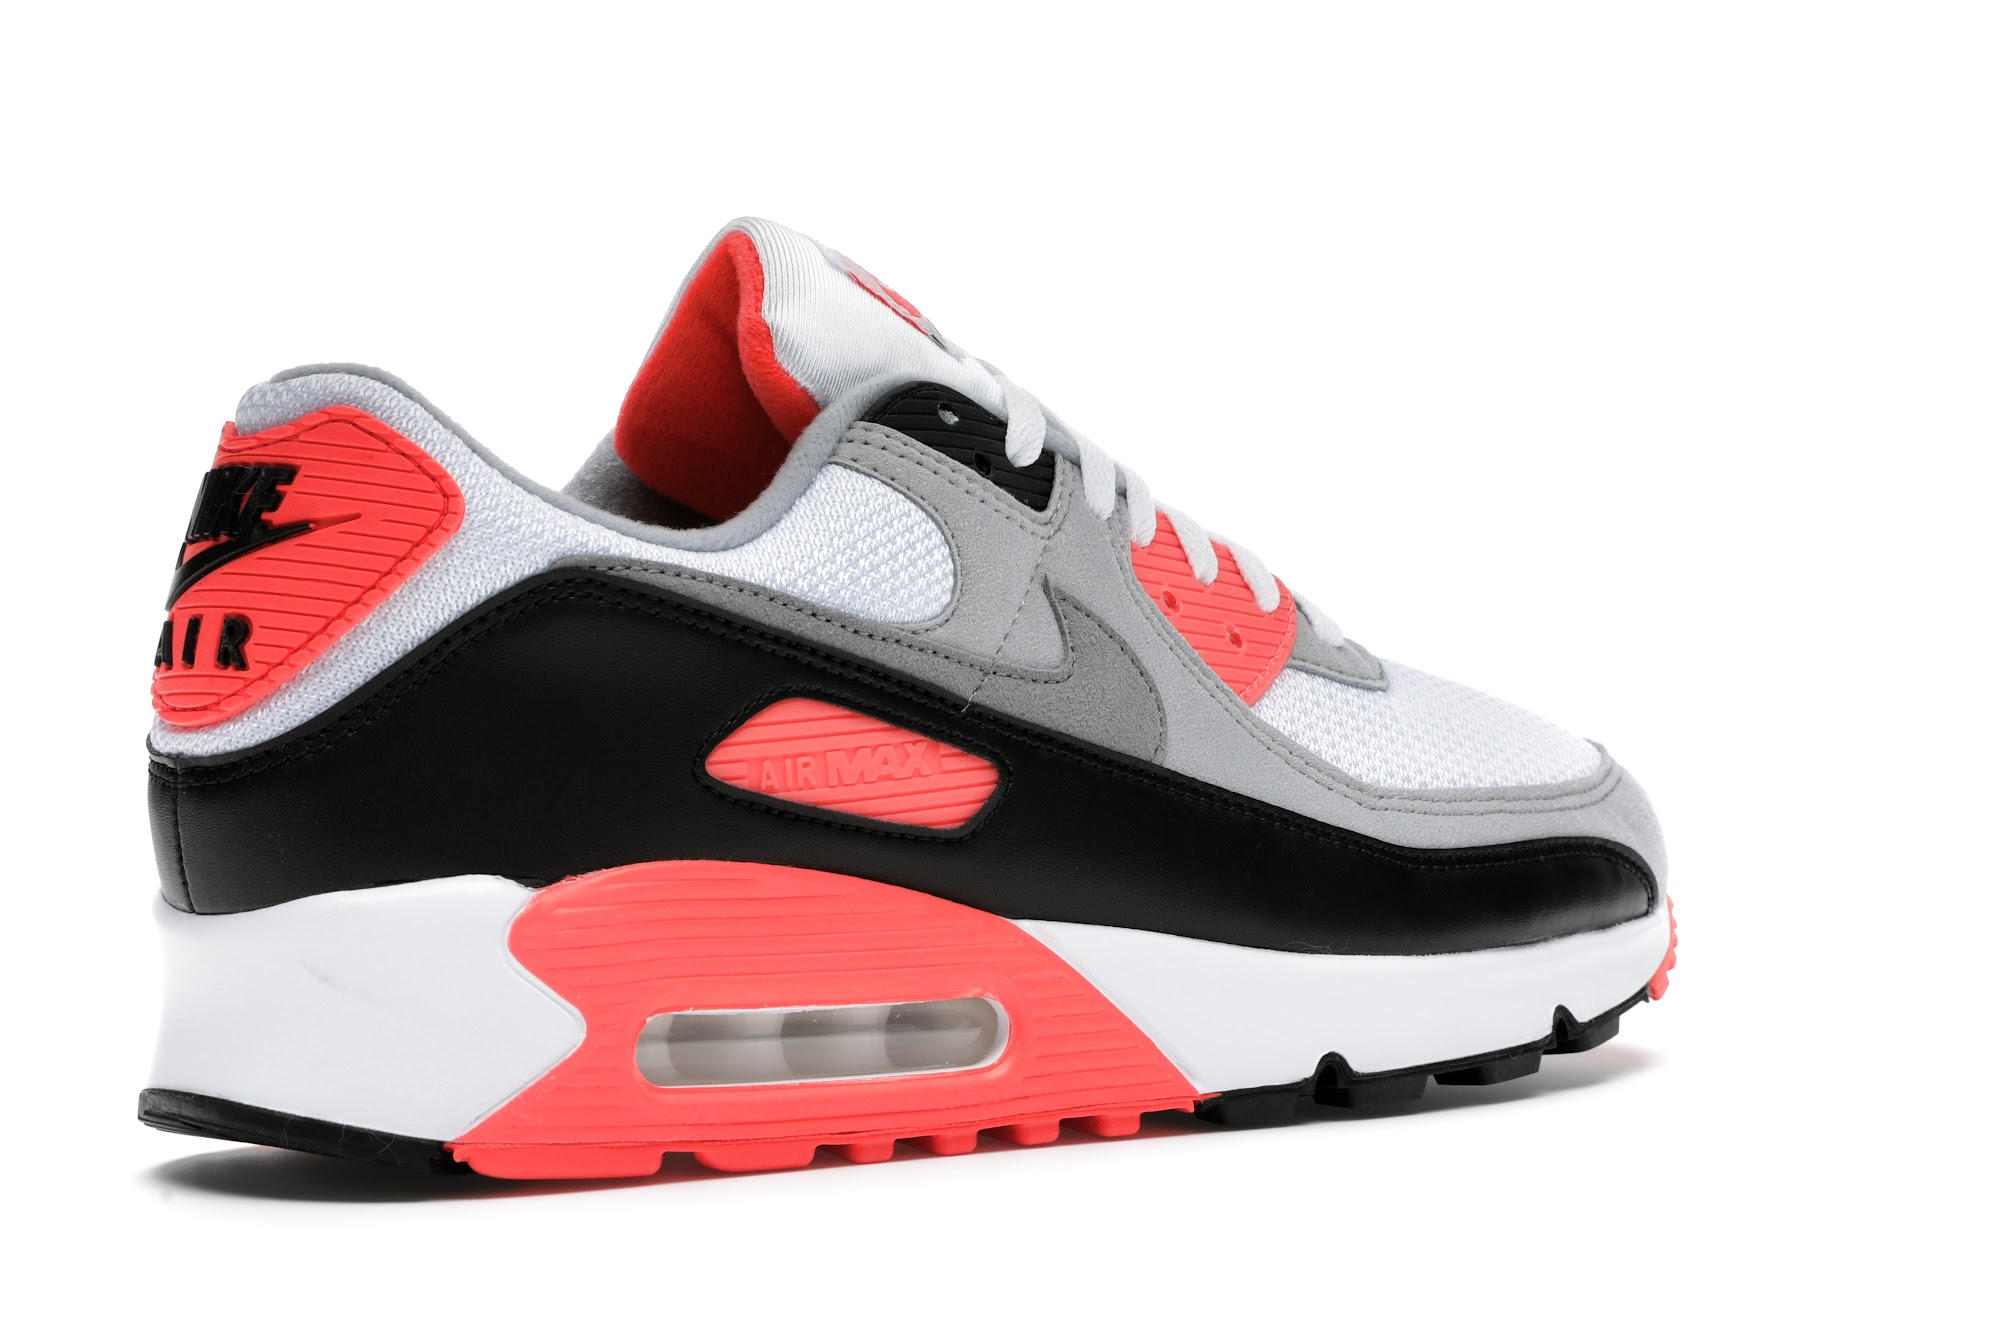 Nike Air Max 90 Infrared (2020)